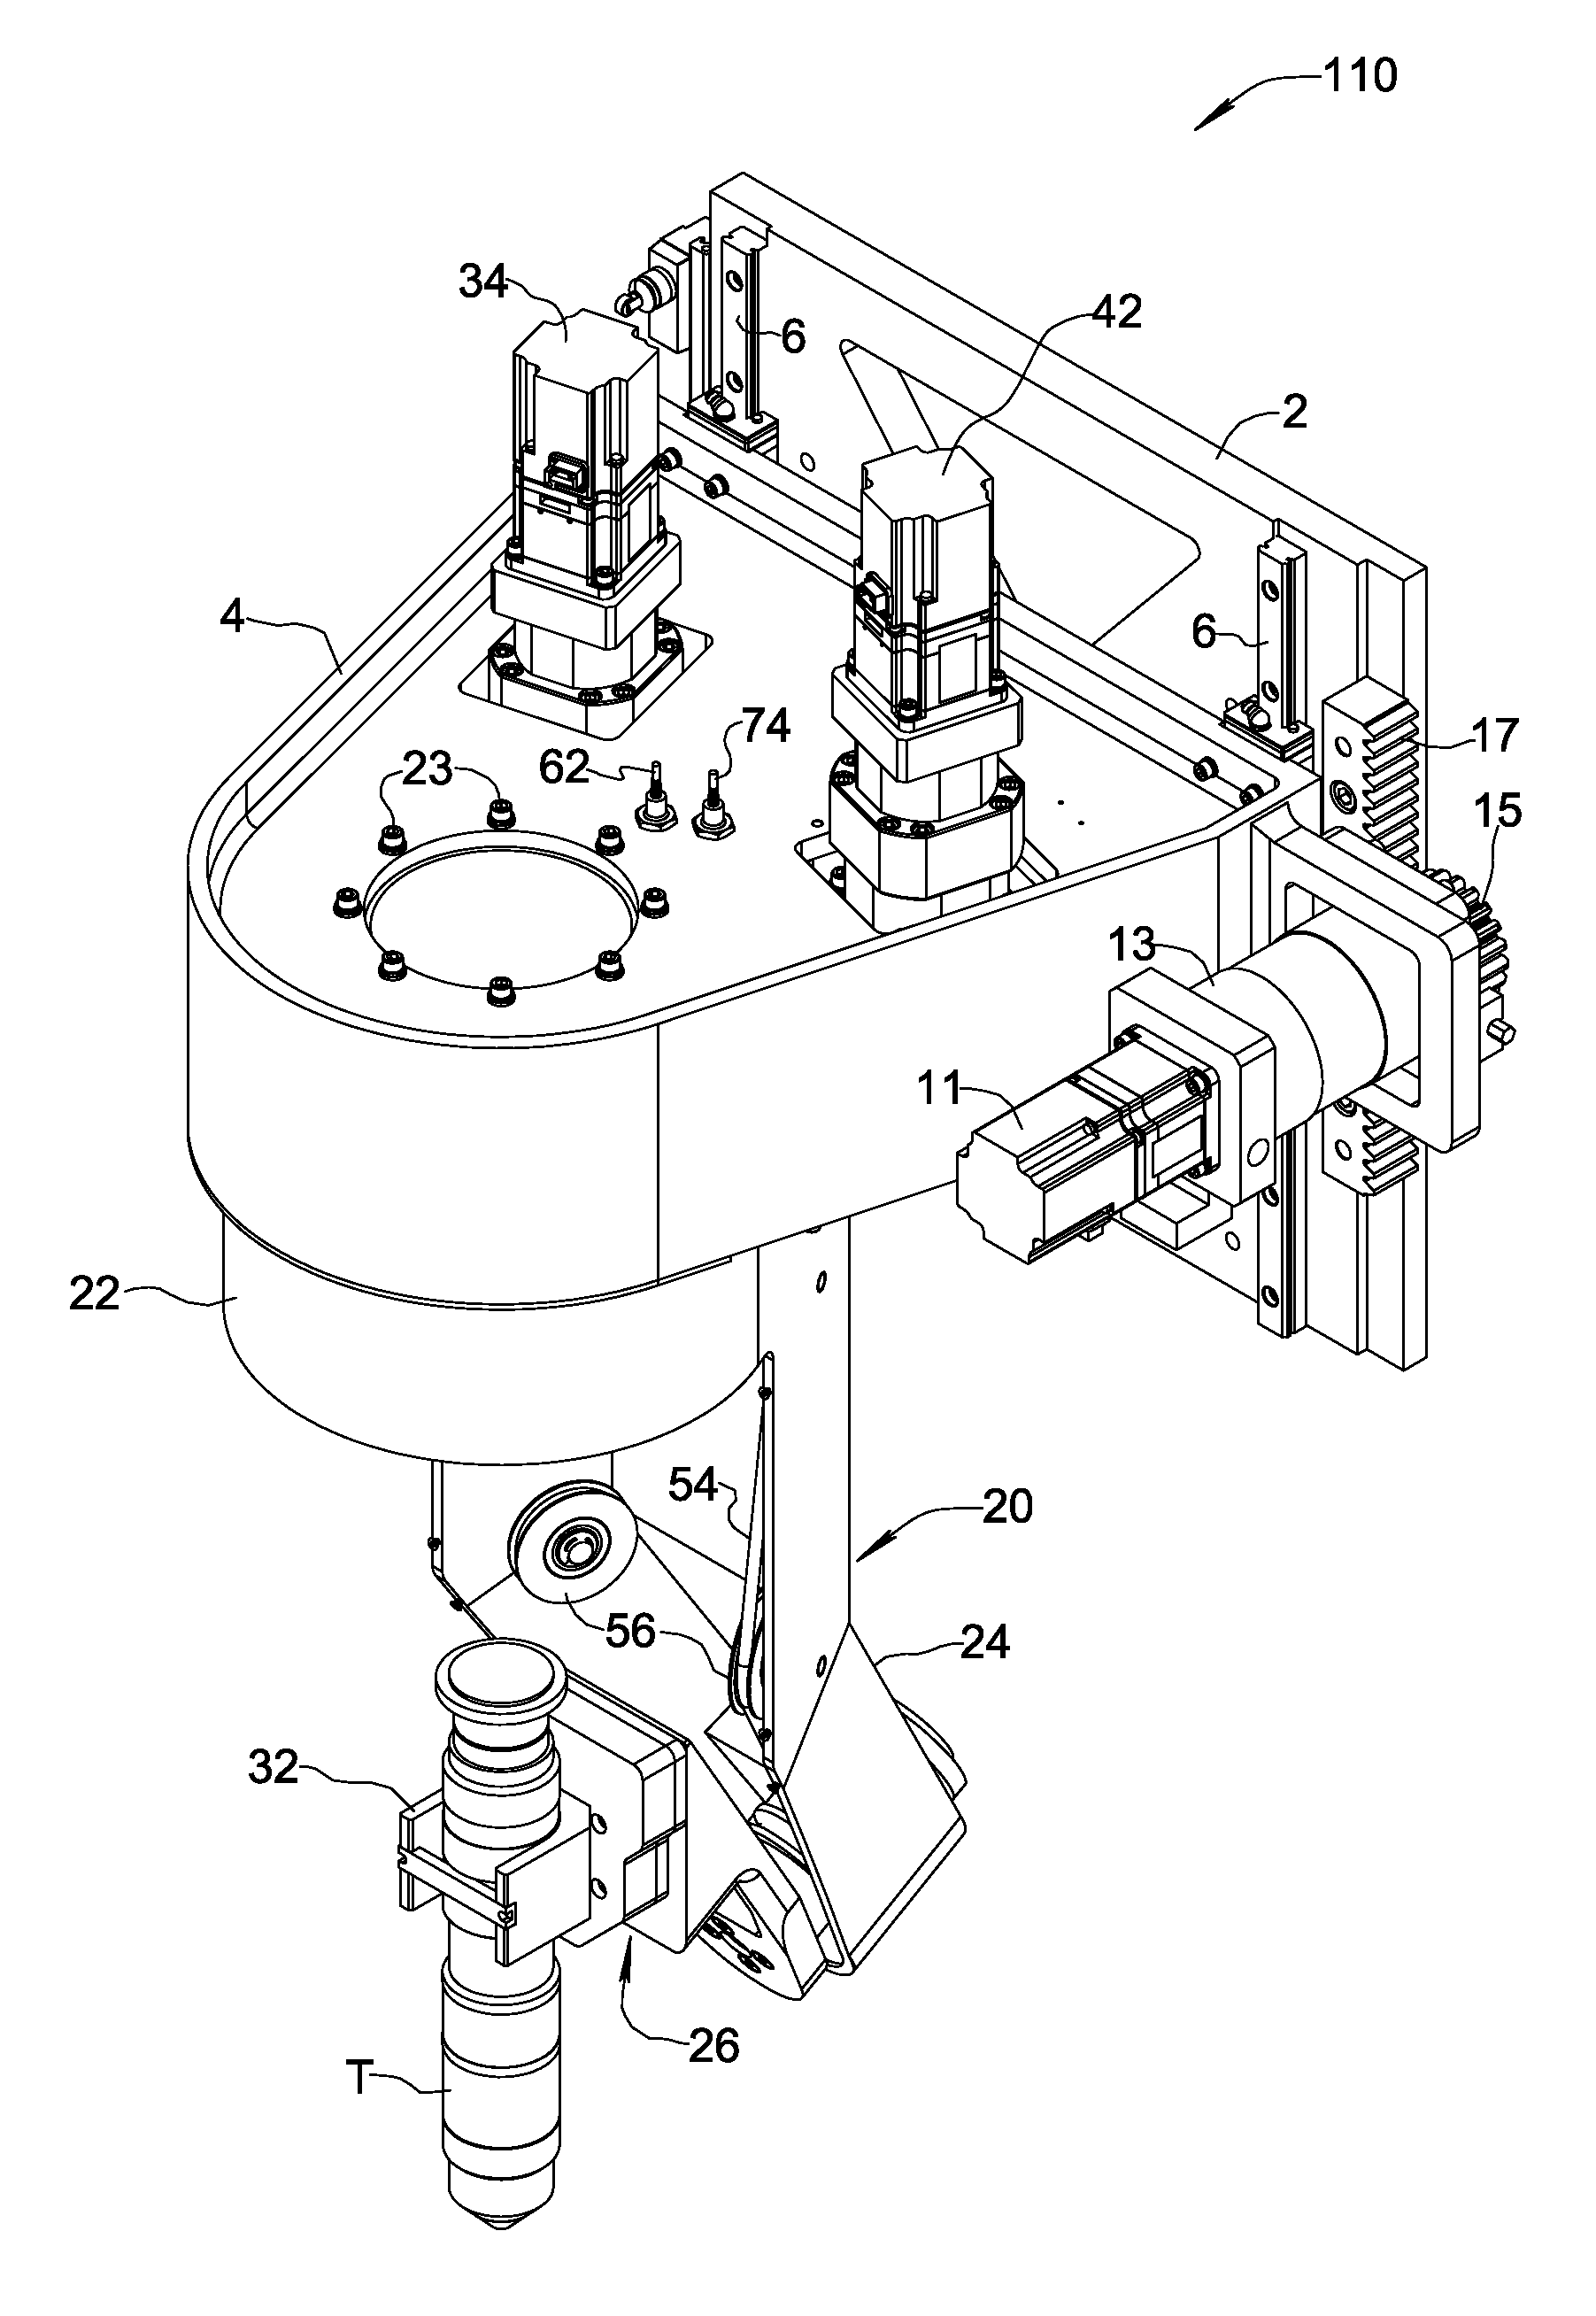 http://patentimages.storage.googleapis.com/US8378250B2/US08378250-20130219-D00000.png